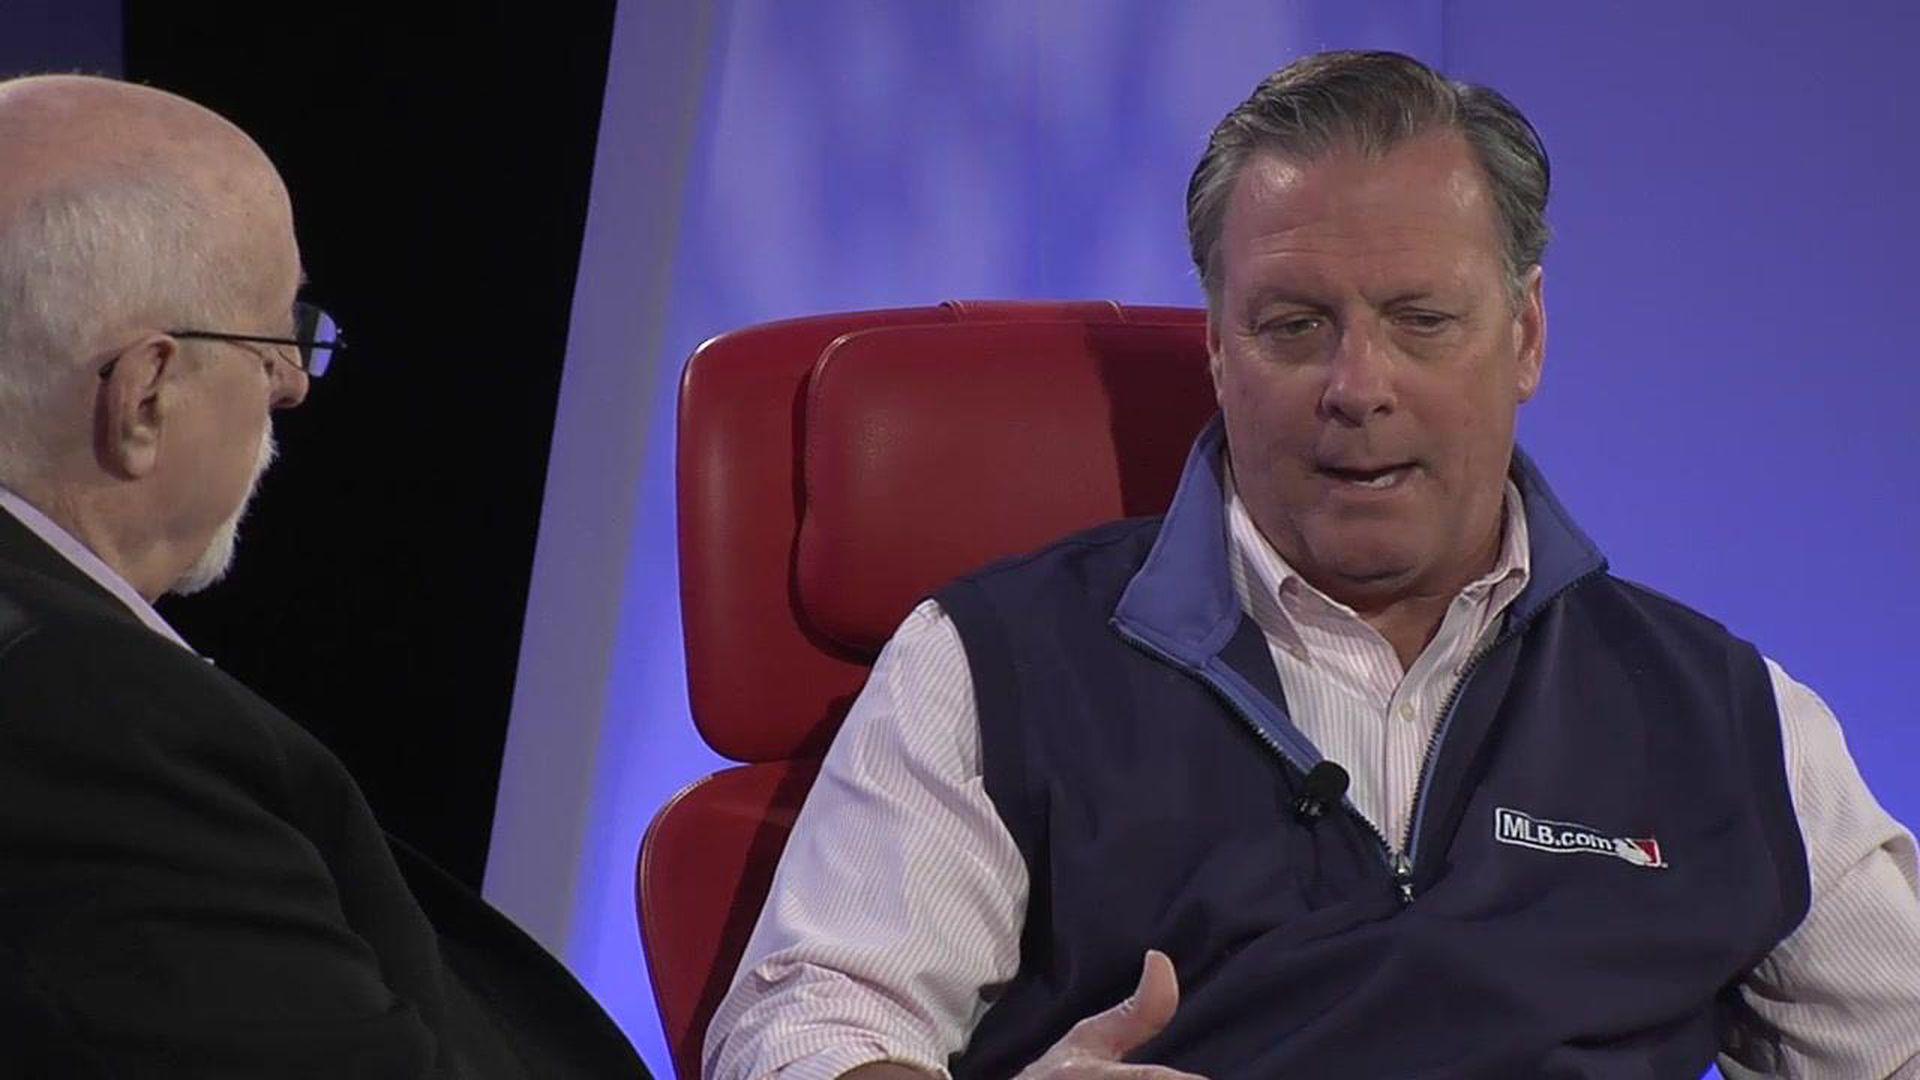 Ex-ejecutivo de MLB Advanced Media forzado a abandonar por mala conducta